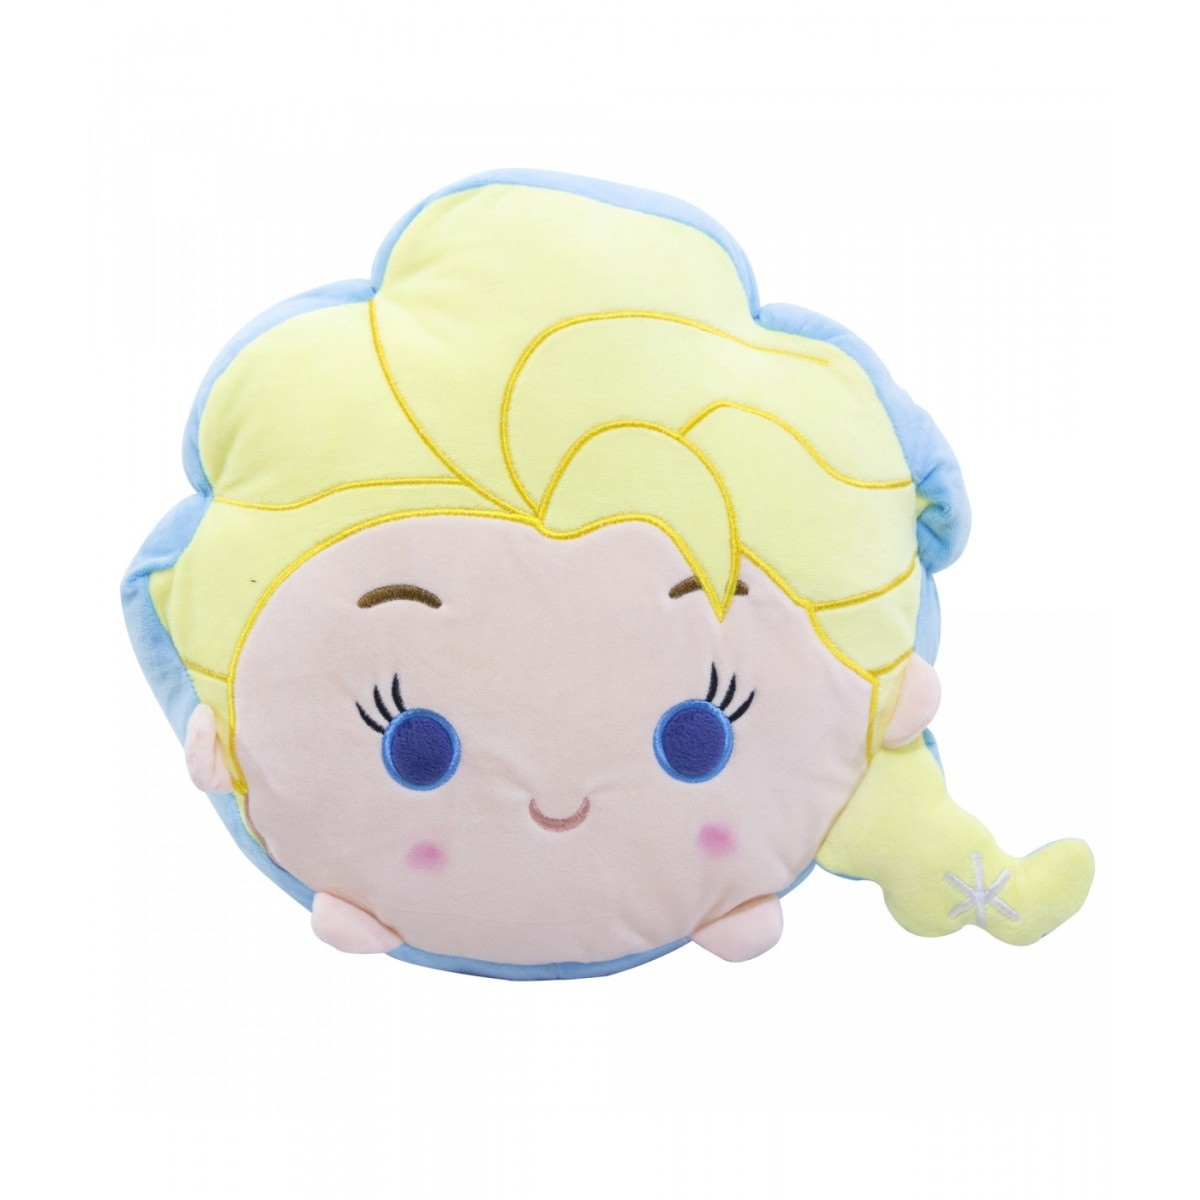 Almofada de Pelúcia Personagem Disney Frozen Rosto Elsa 41cm